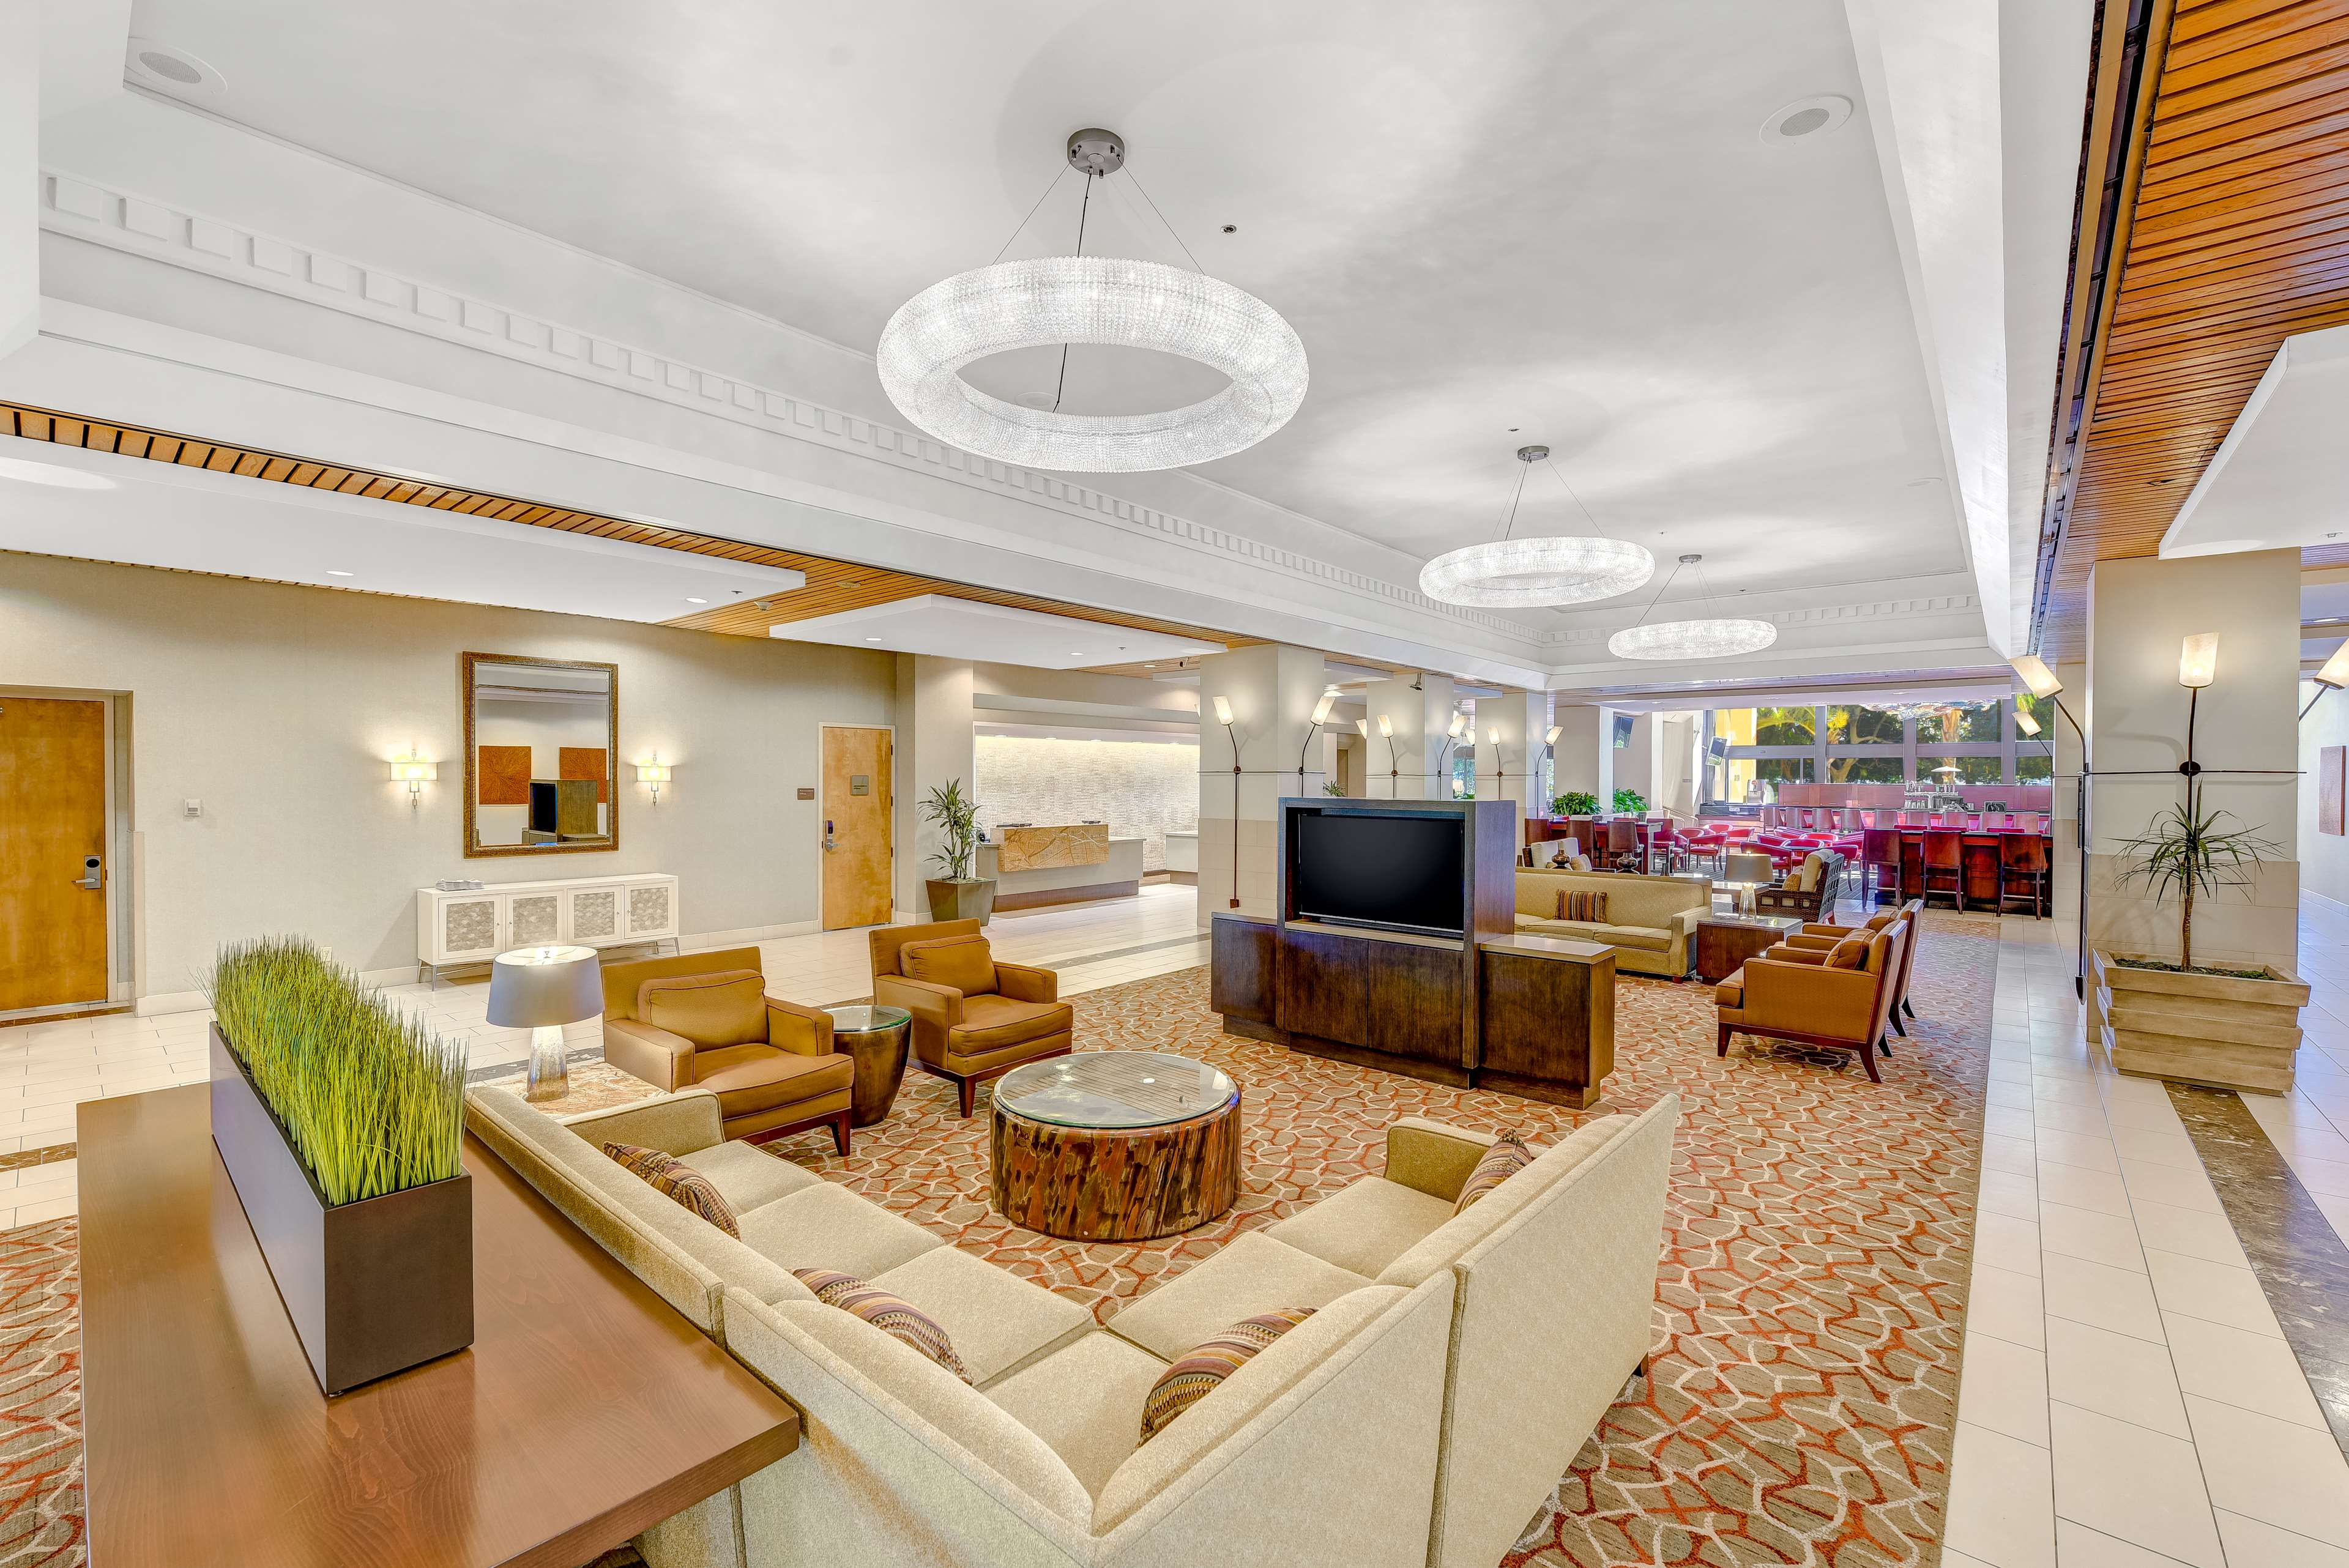 DoubleTree by Hilton Hotel Anaheim - Orange County image 17